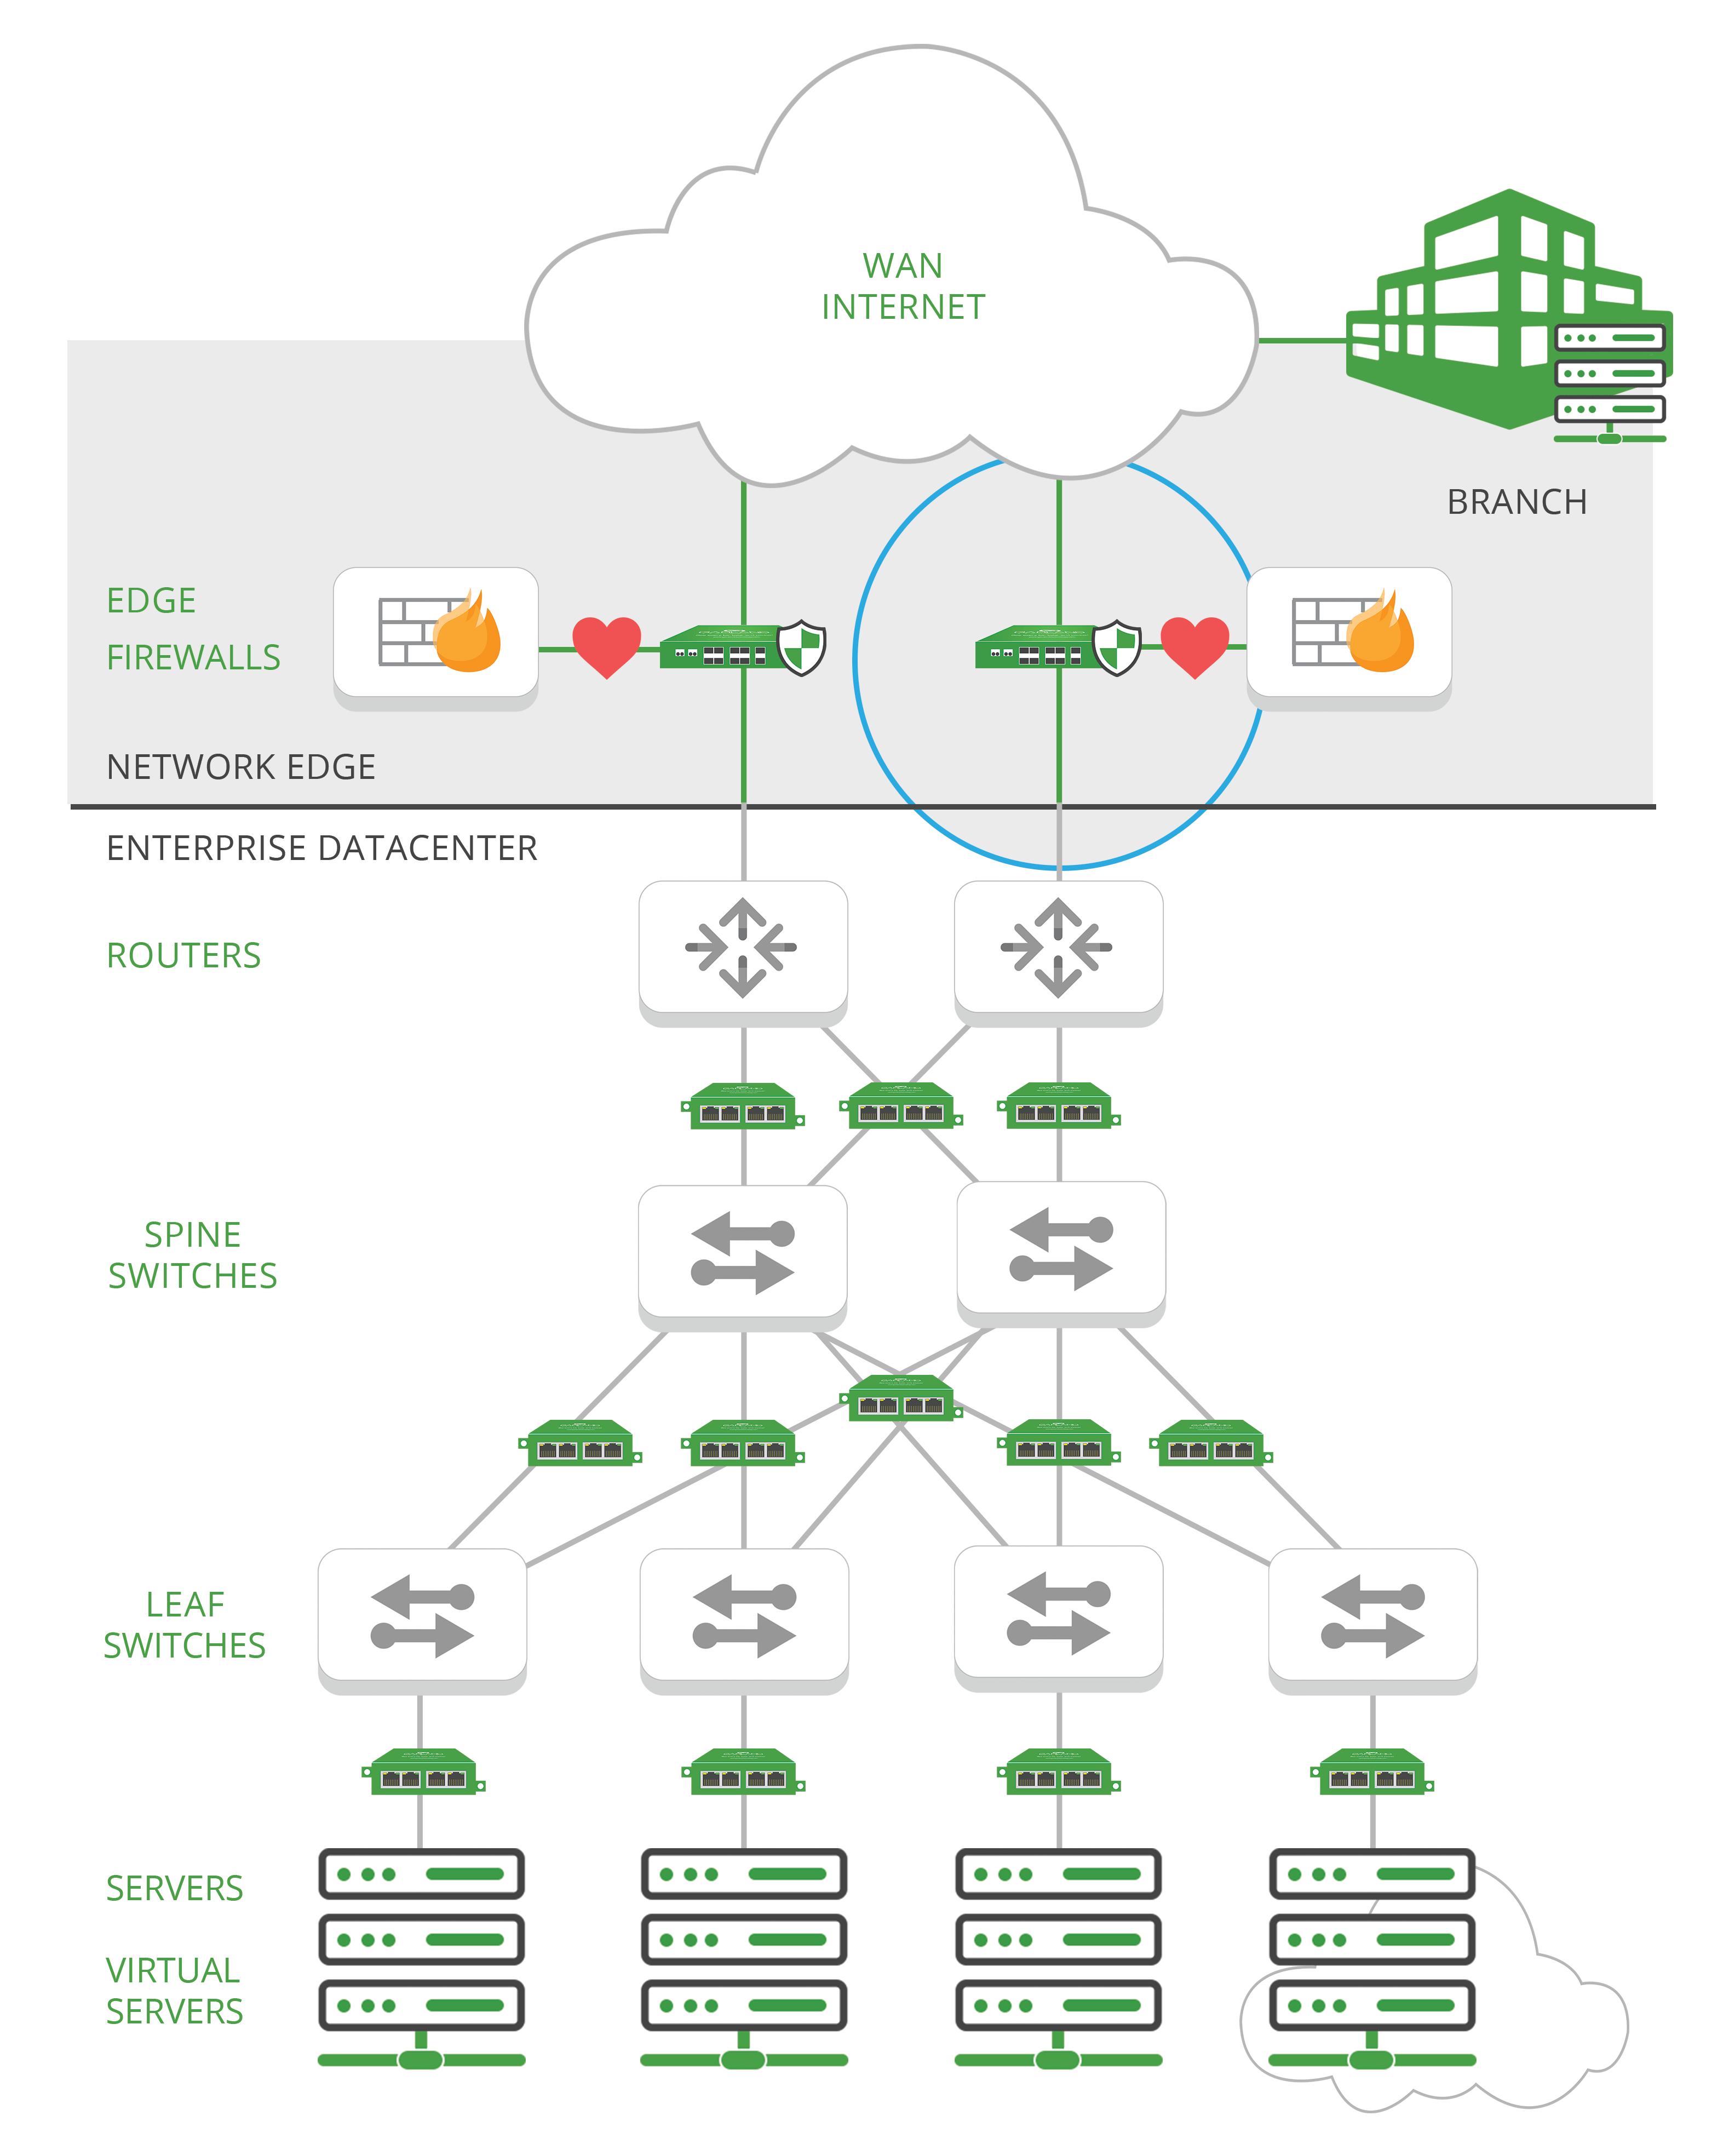 Network Edge topology21-LR